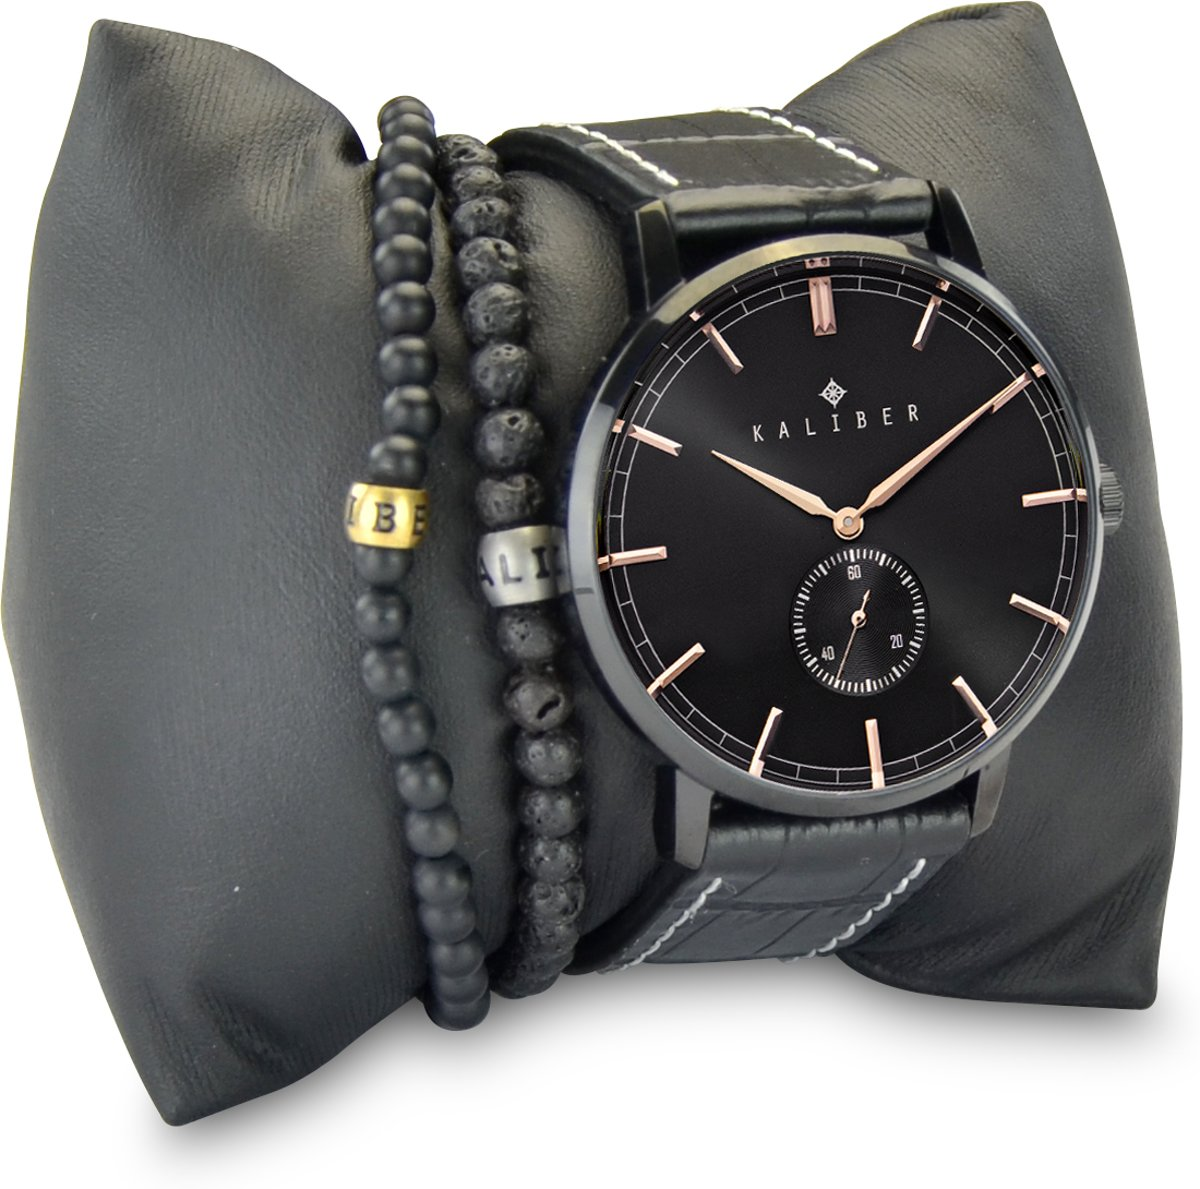 Kaliber 7KA SET006 Horloge Set met Armbanden - Leren Band - Ø 40 mm - Zwart / Rosékleurig kopen